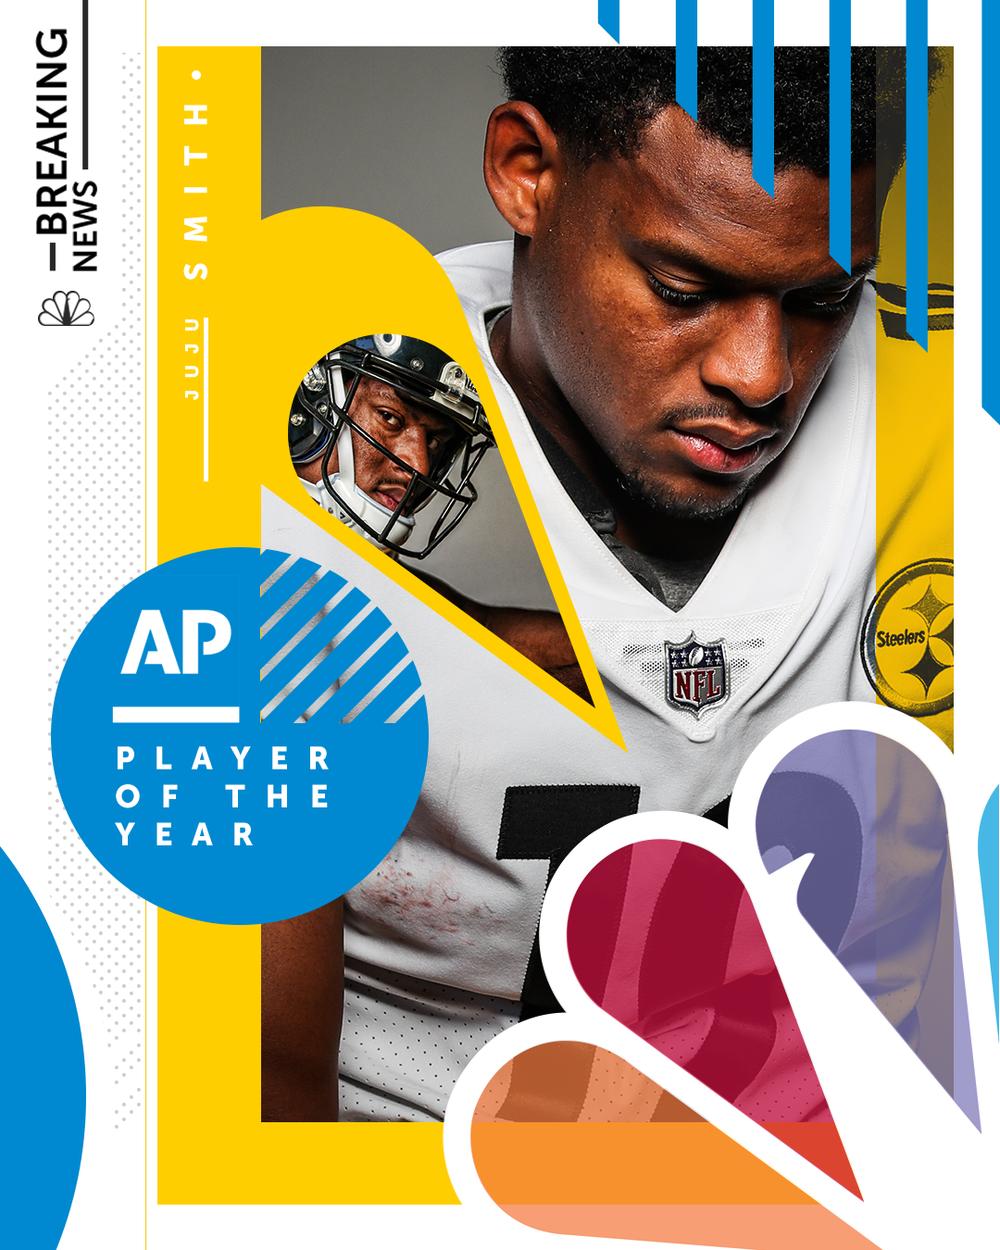 NBC_Branding_Shapes_v0202-_-Team-Branded-_-Steelers.png